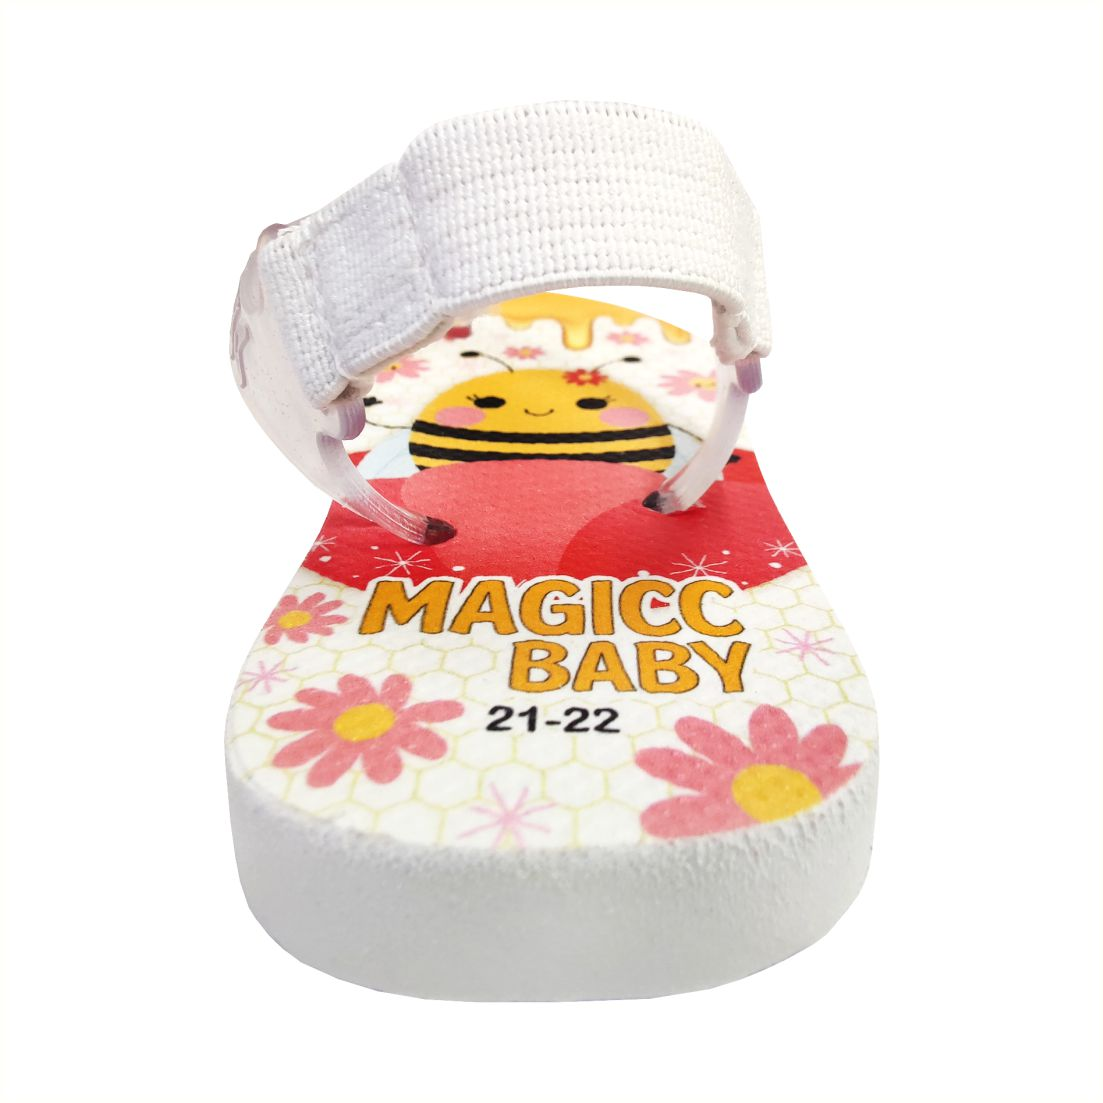 Chinelo Menina Bebê  Sandália Abelhinha Magicc Baby